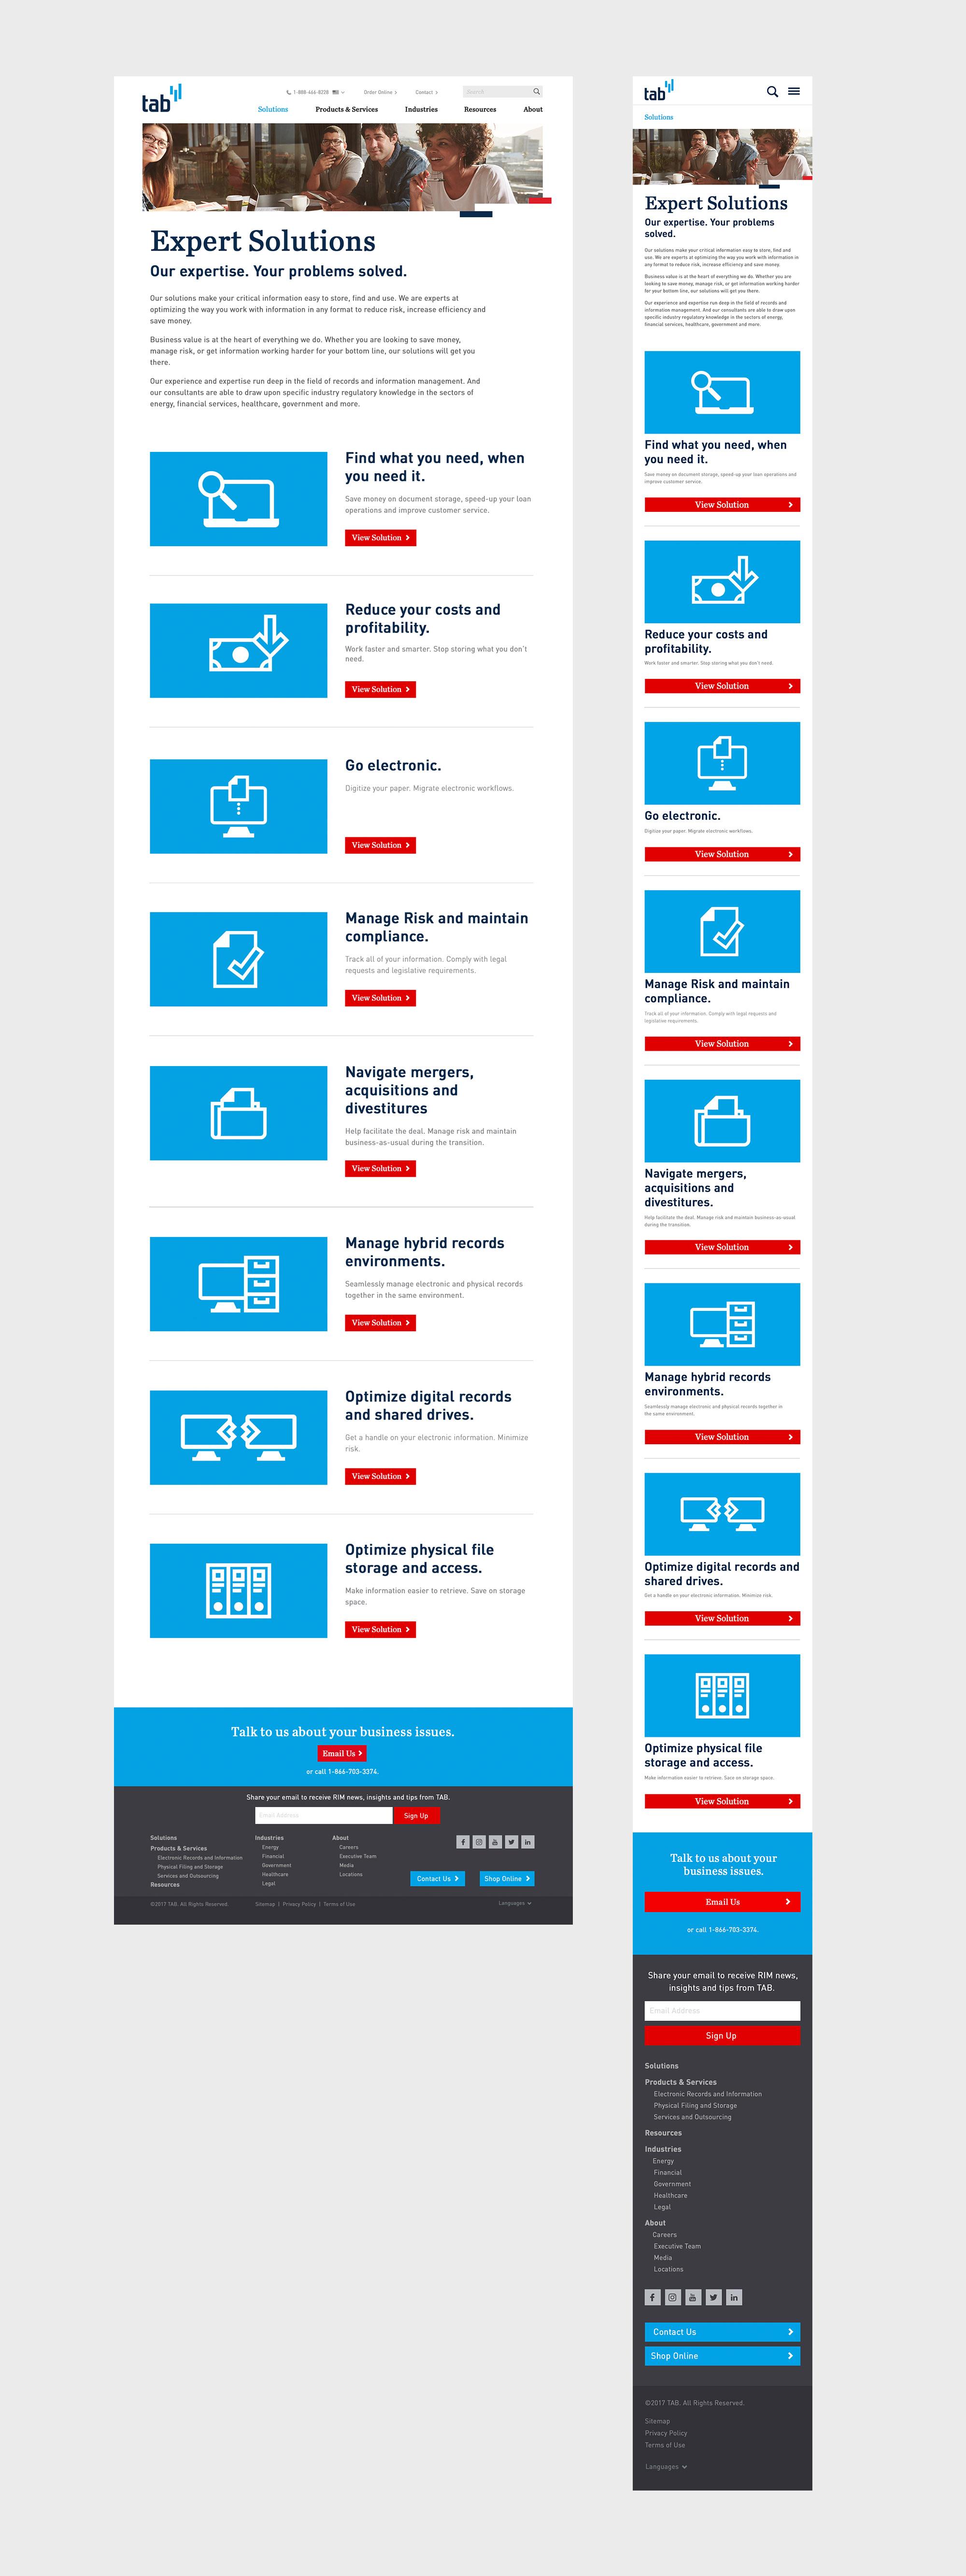 02_Tab_Solutions_Mockup1.jpg